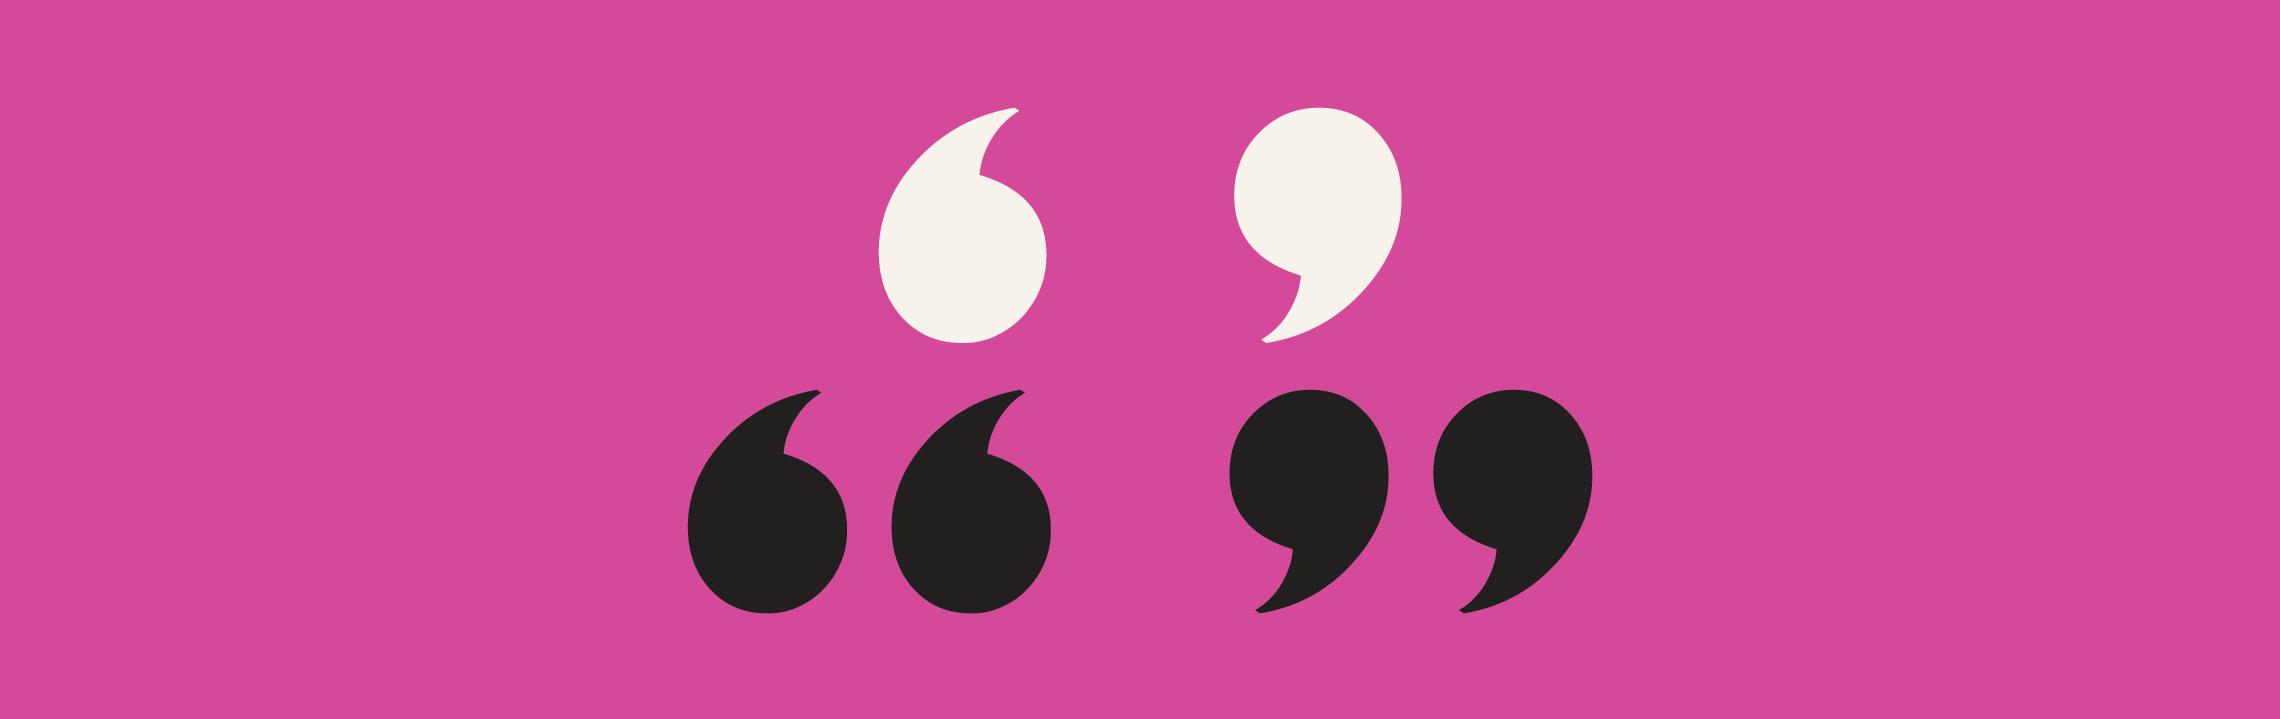 Quotation marks single vs double esl library blog